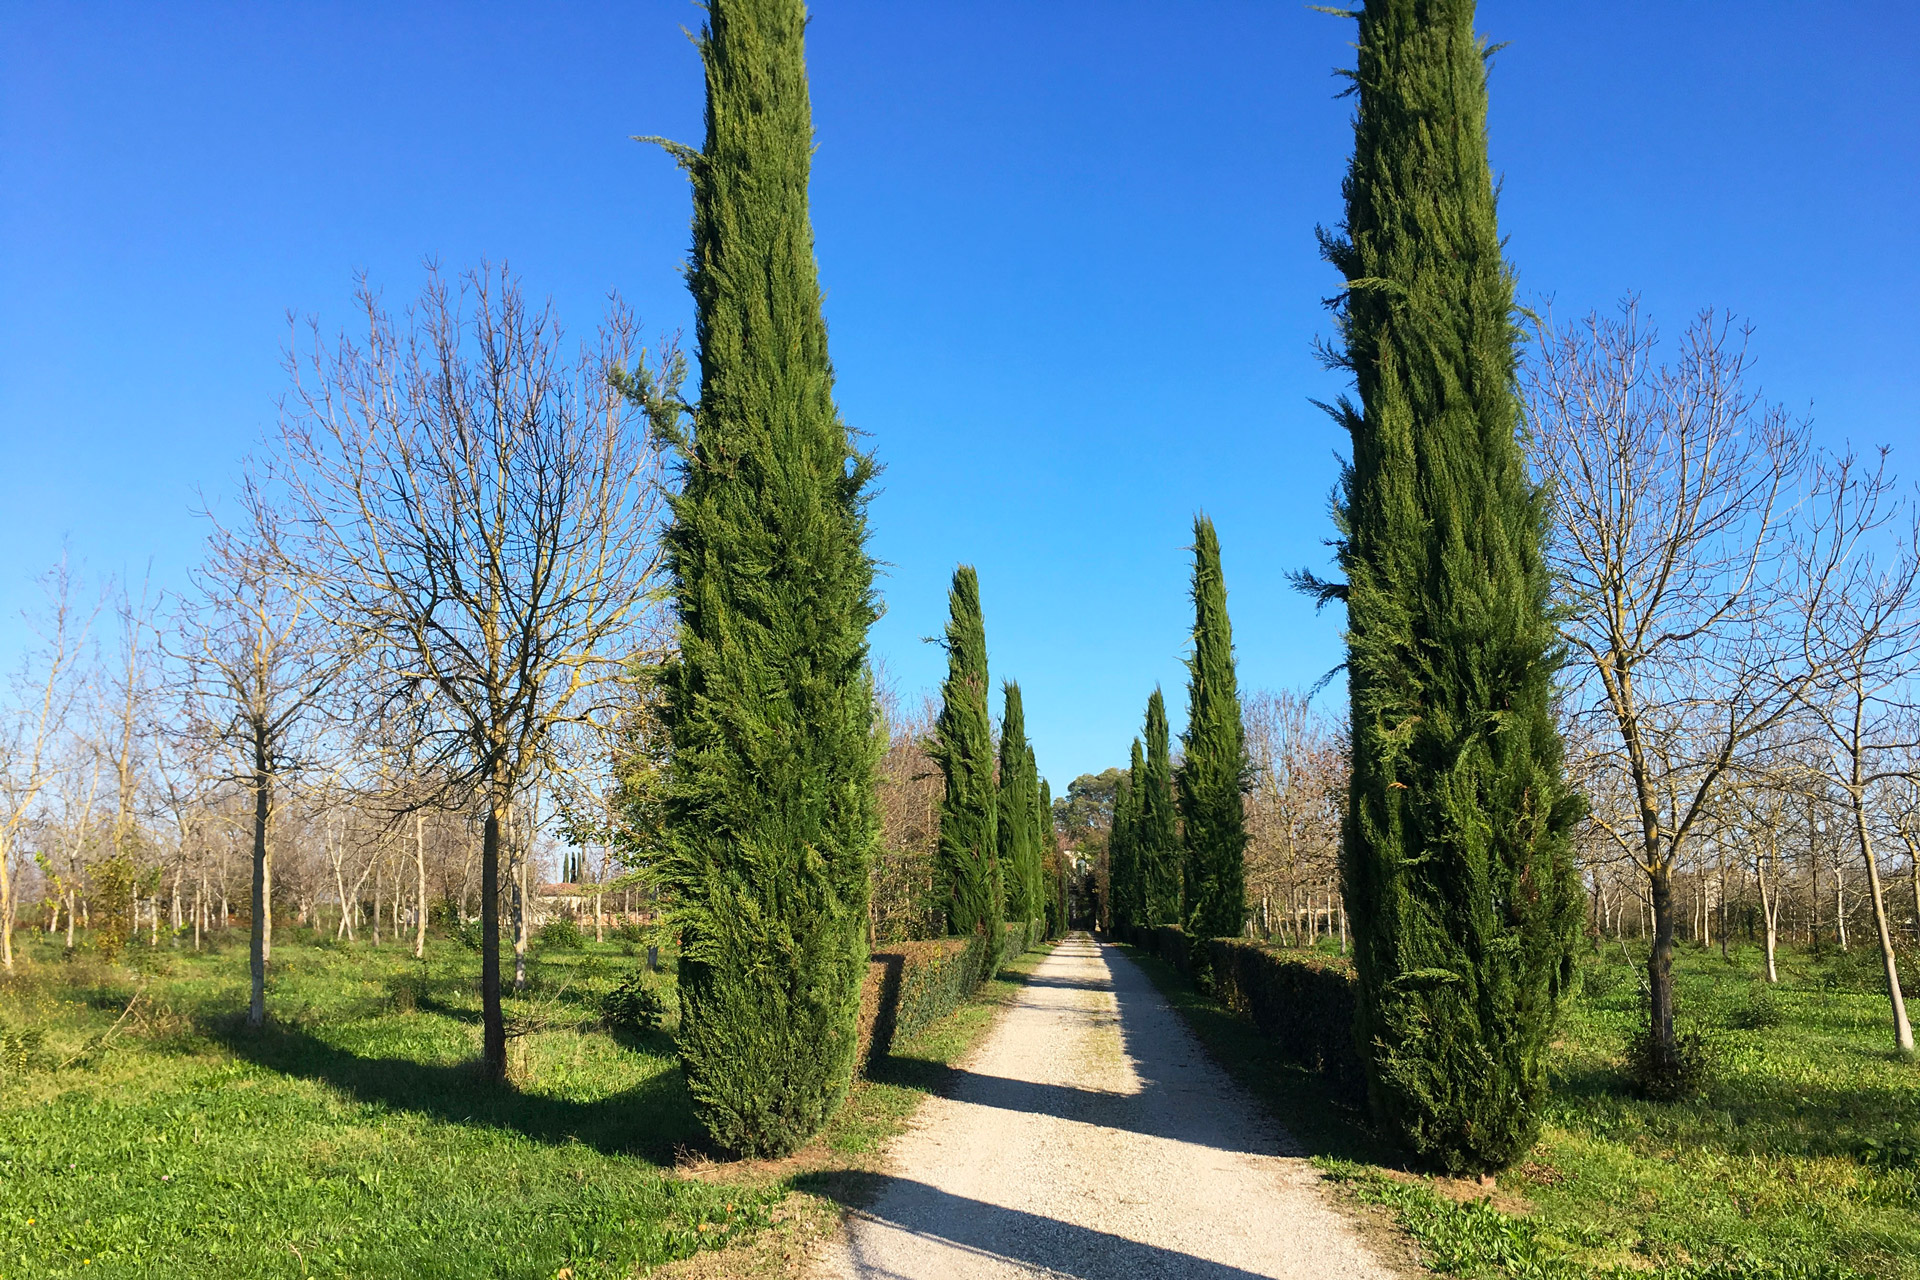 Cartura_Viale di Villa Mocenigo-Randi